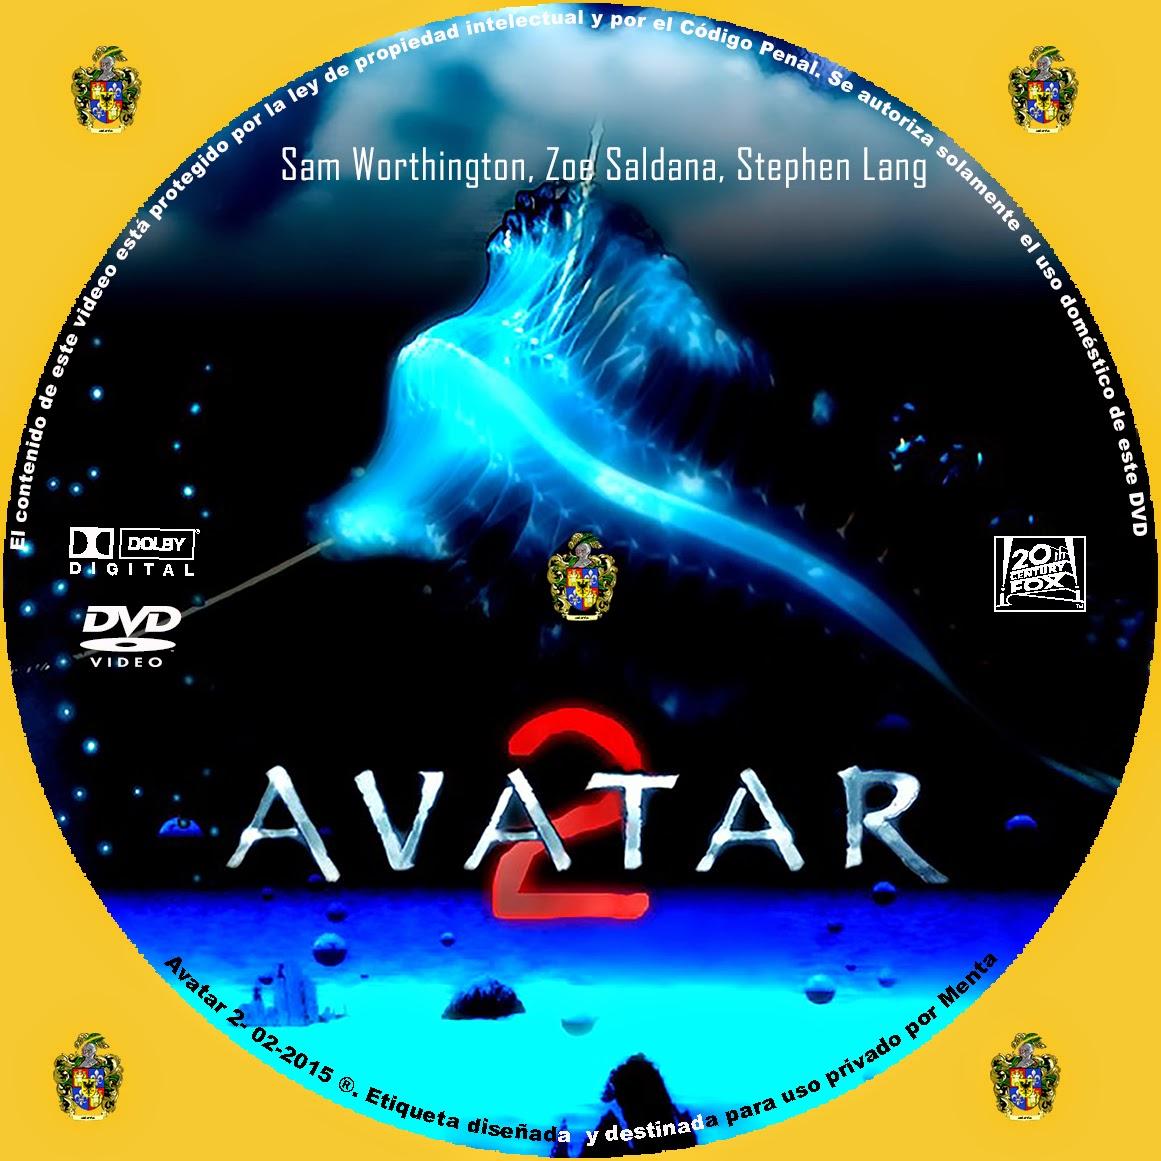 Avatar 2 Yet: Caratulas Y Etiquetas: Avatar 2